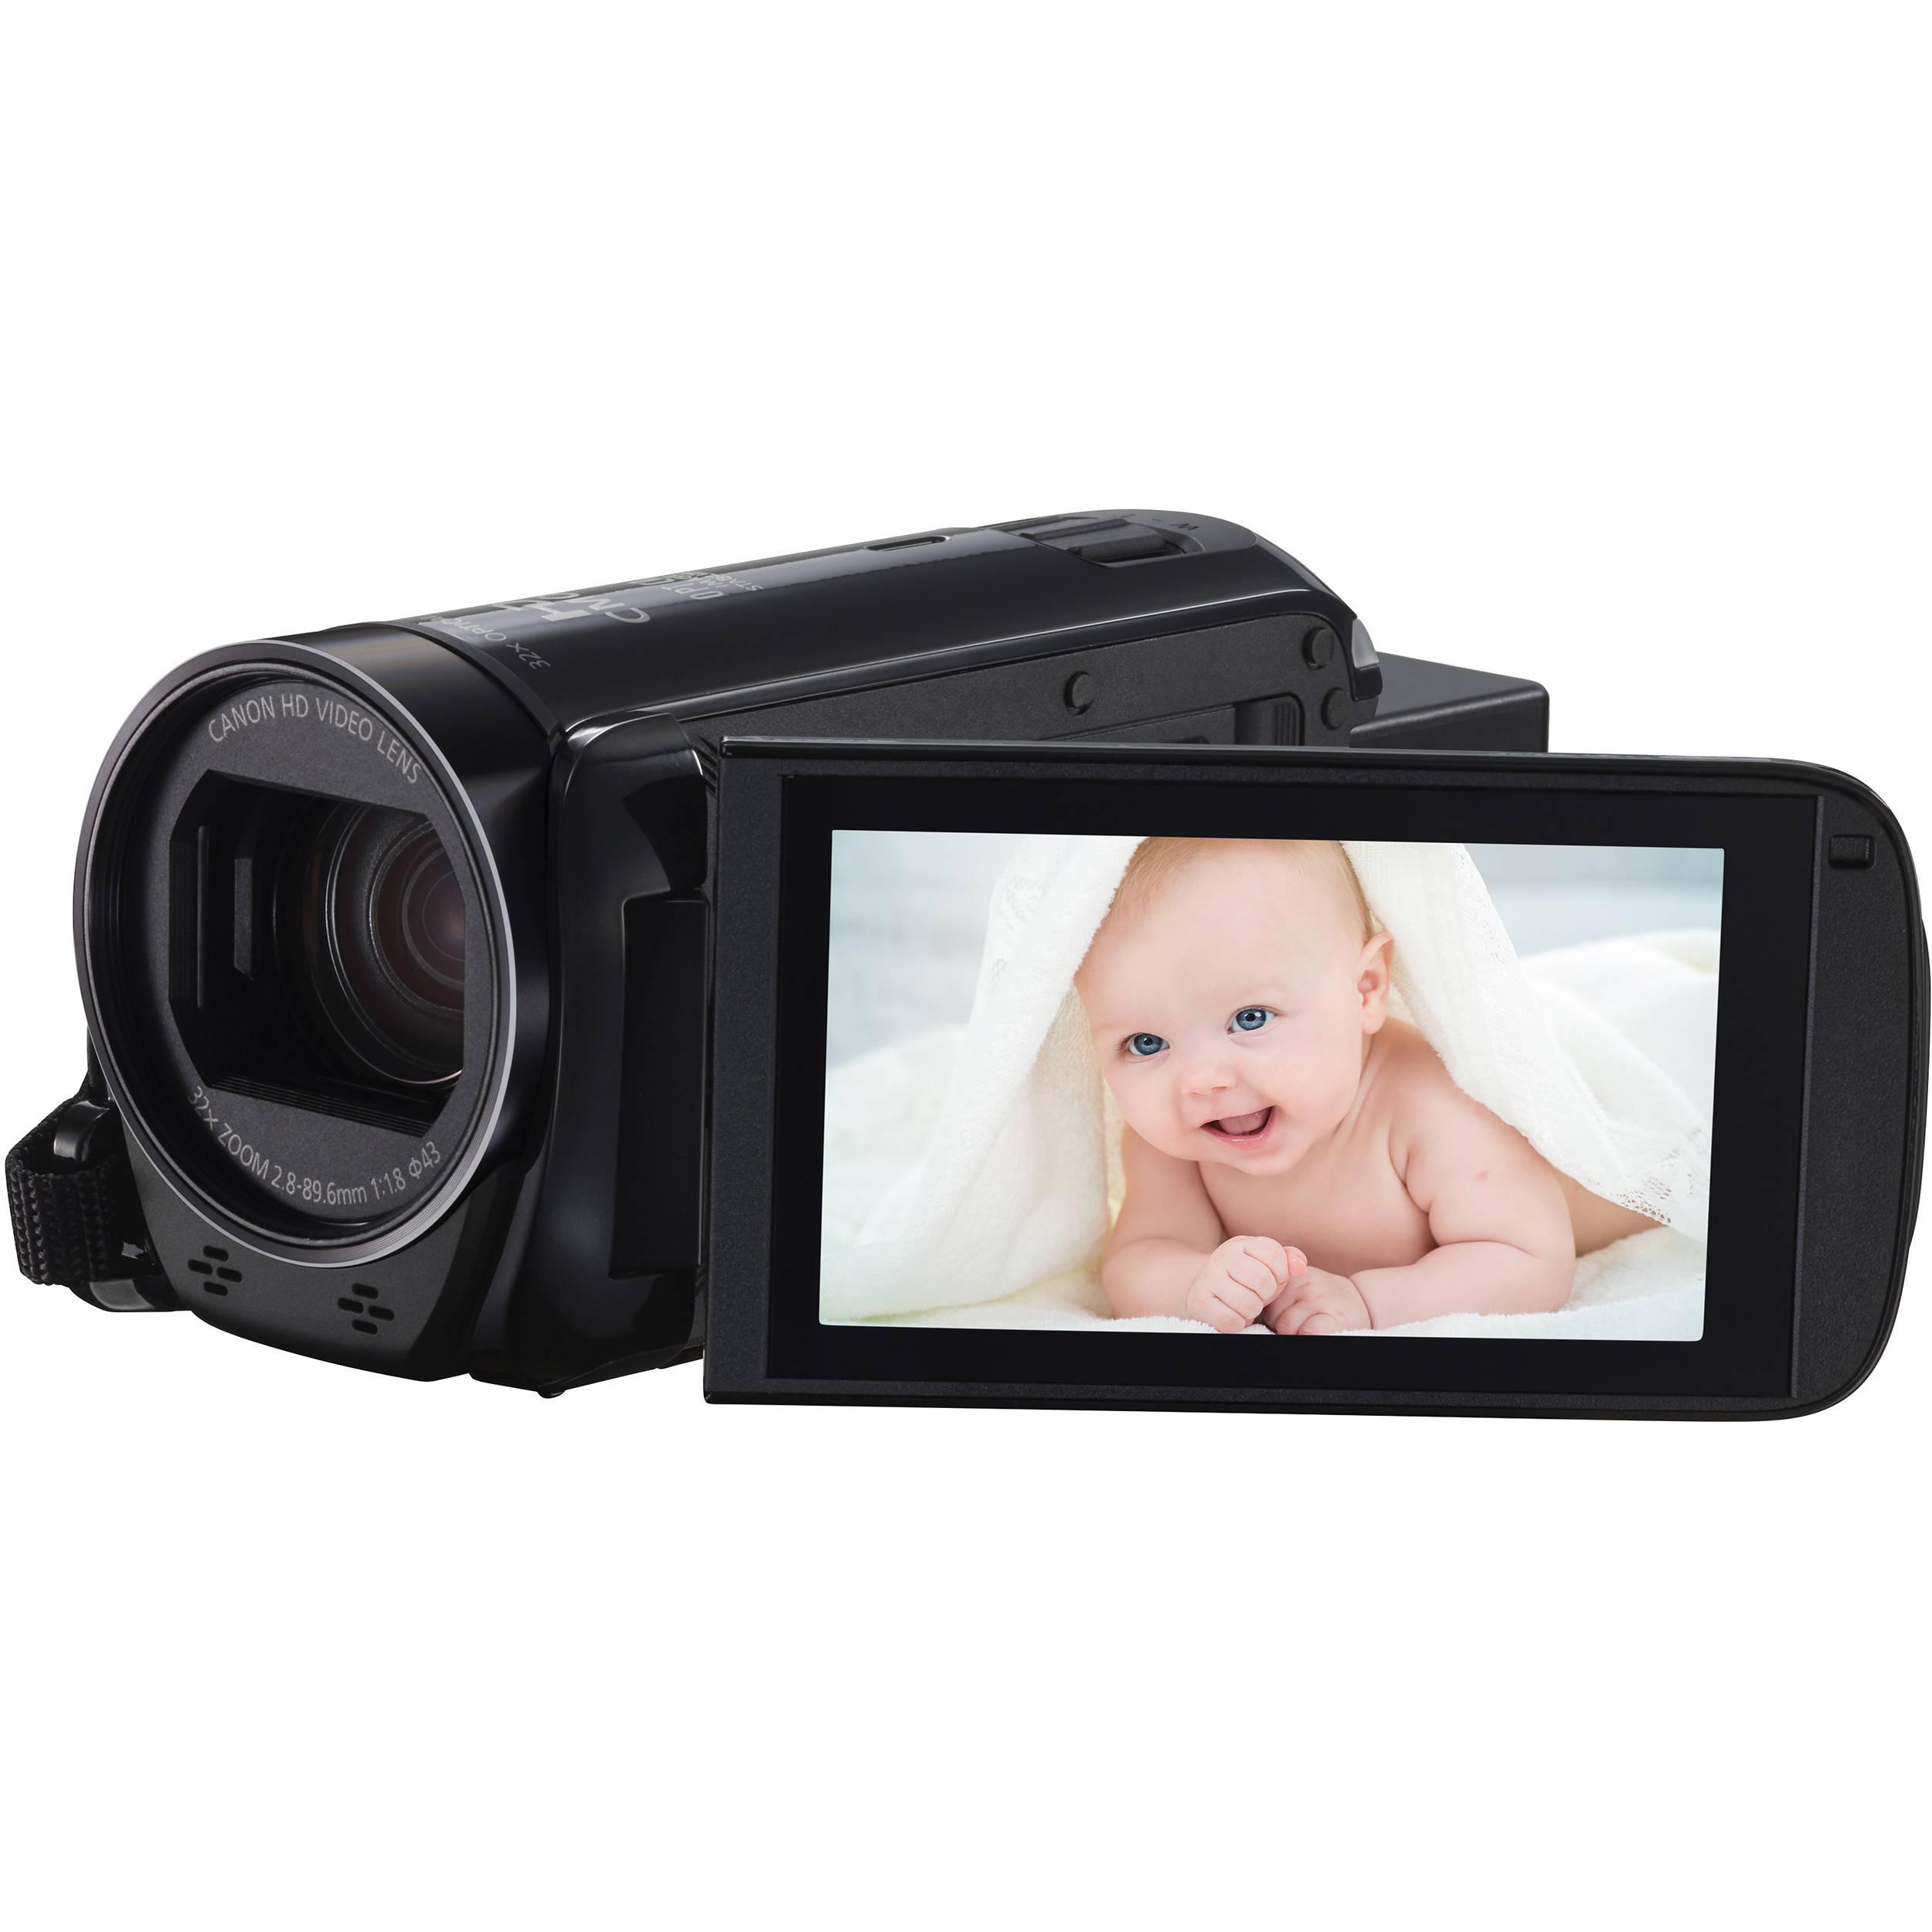 canon vixia hf r700 full hd camcorder black 1238c001 b h photo rh bhphotovideo com Canon VIXIA HF R20 Canon Vixia Mini